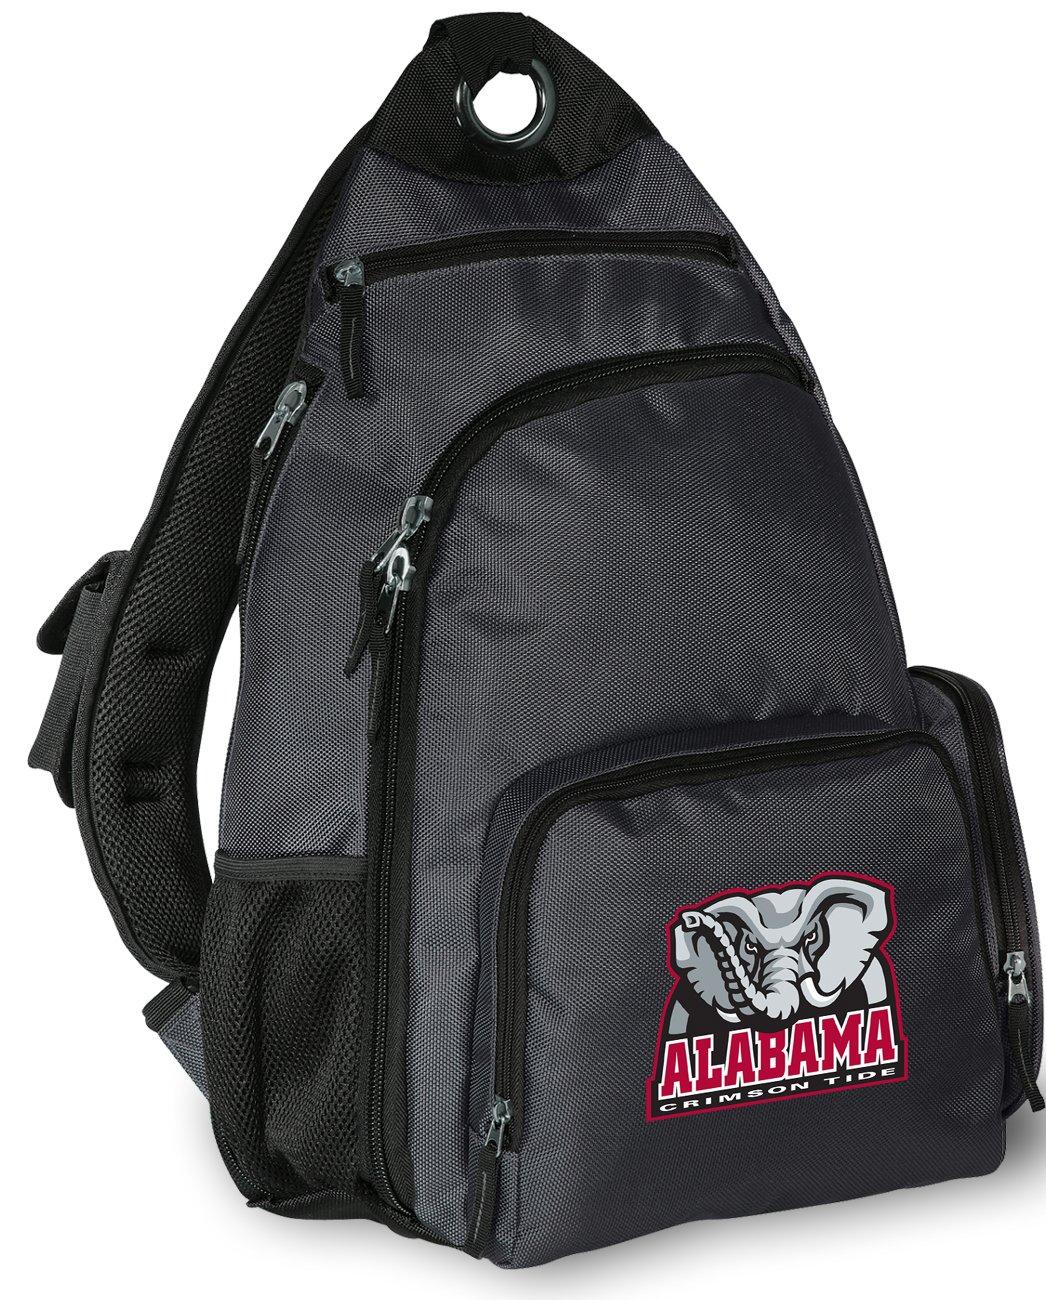 Alabama Backpack Cross Body University of Alabama Sling Bag by Broad Bay (Image #1)